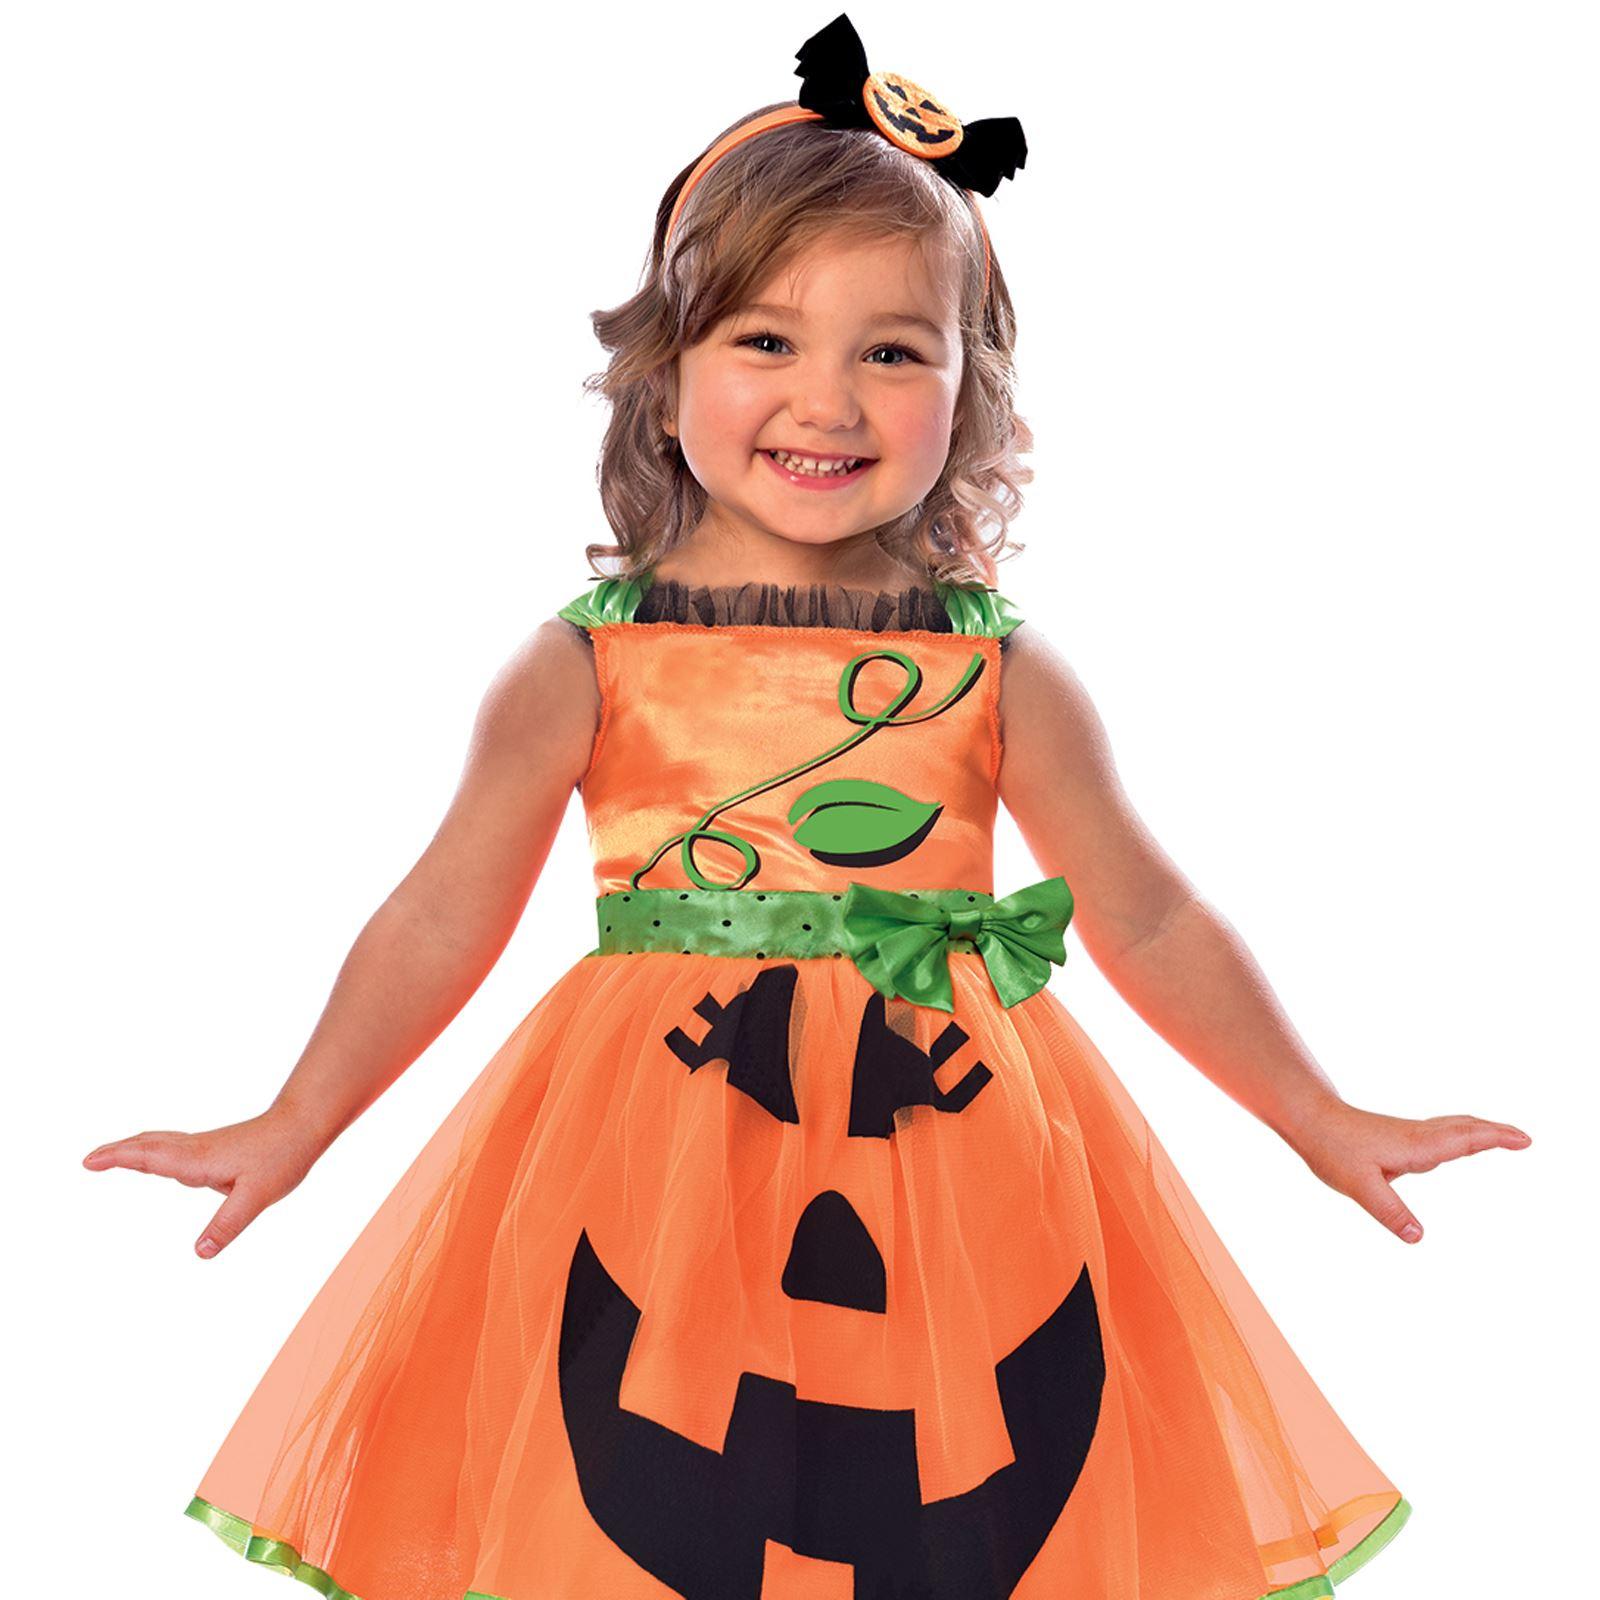 1dce81086 Kids Girls Toddlers Babies Cute Pumpkin Jack O Lantern Halloween ...